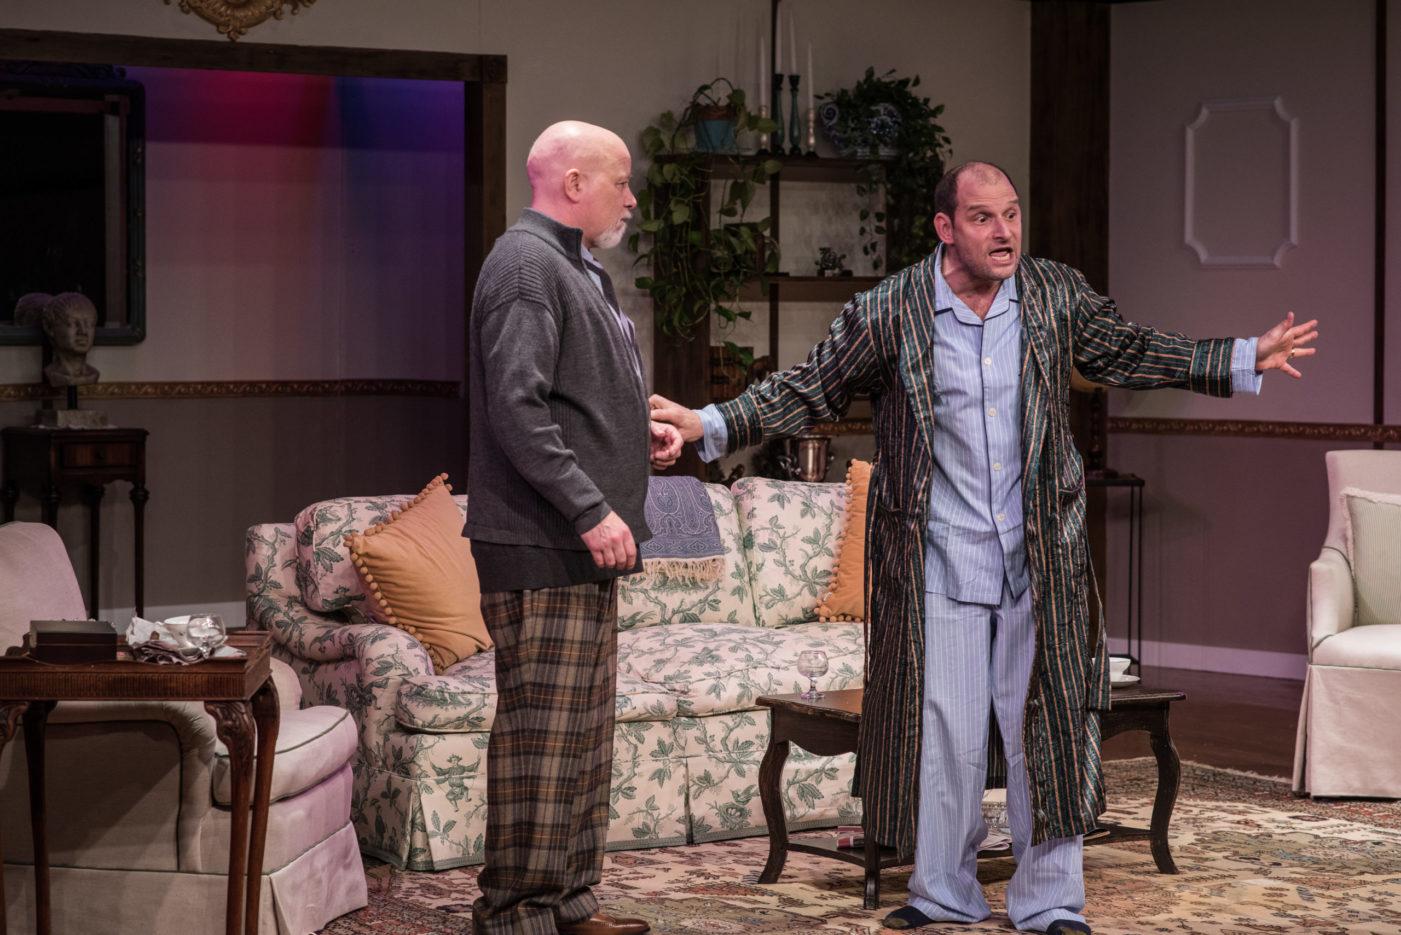 Scott Wilson as Harry and John Leonard as Tobias in Edward Albee's